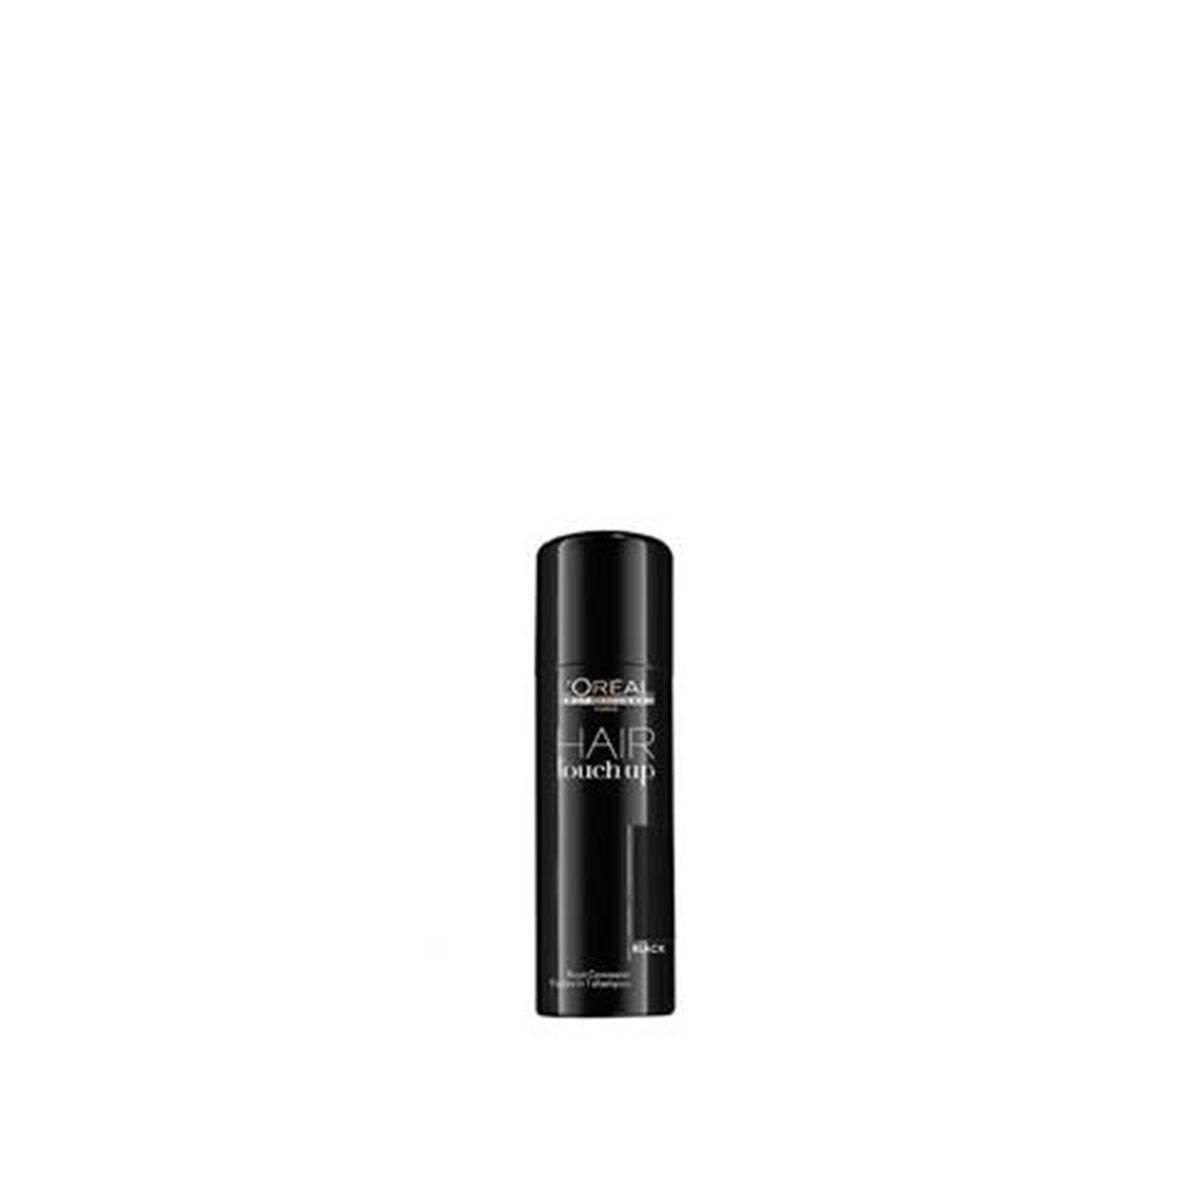 Hair Touch Up Black 75ml Spray